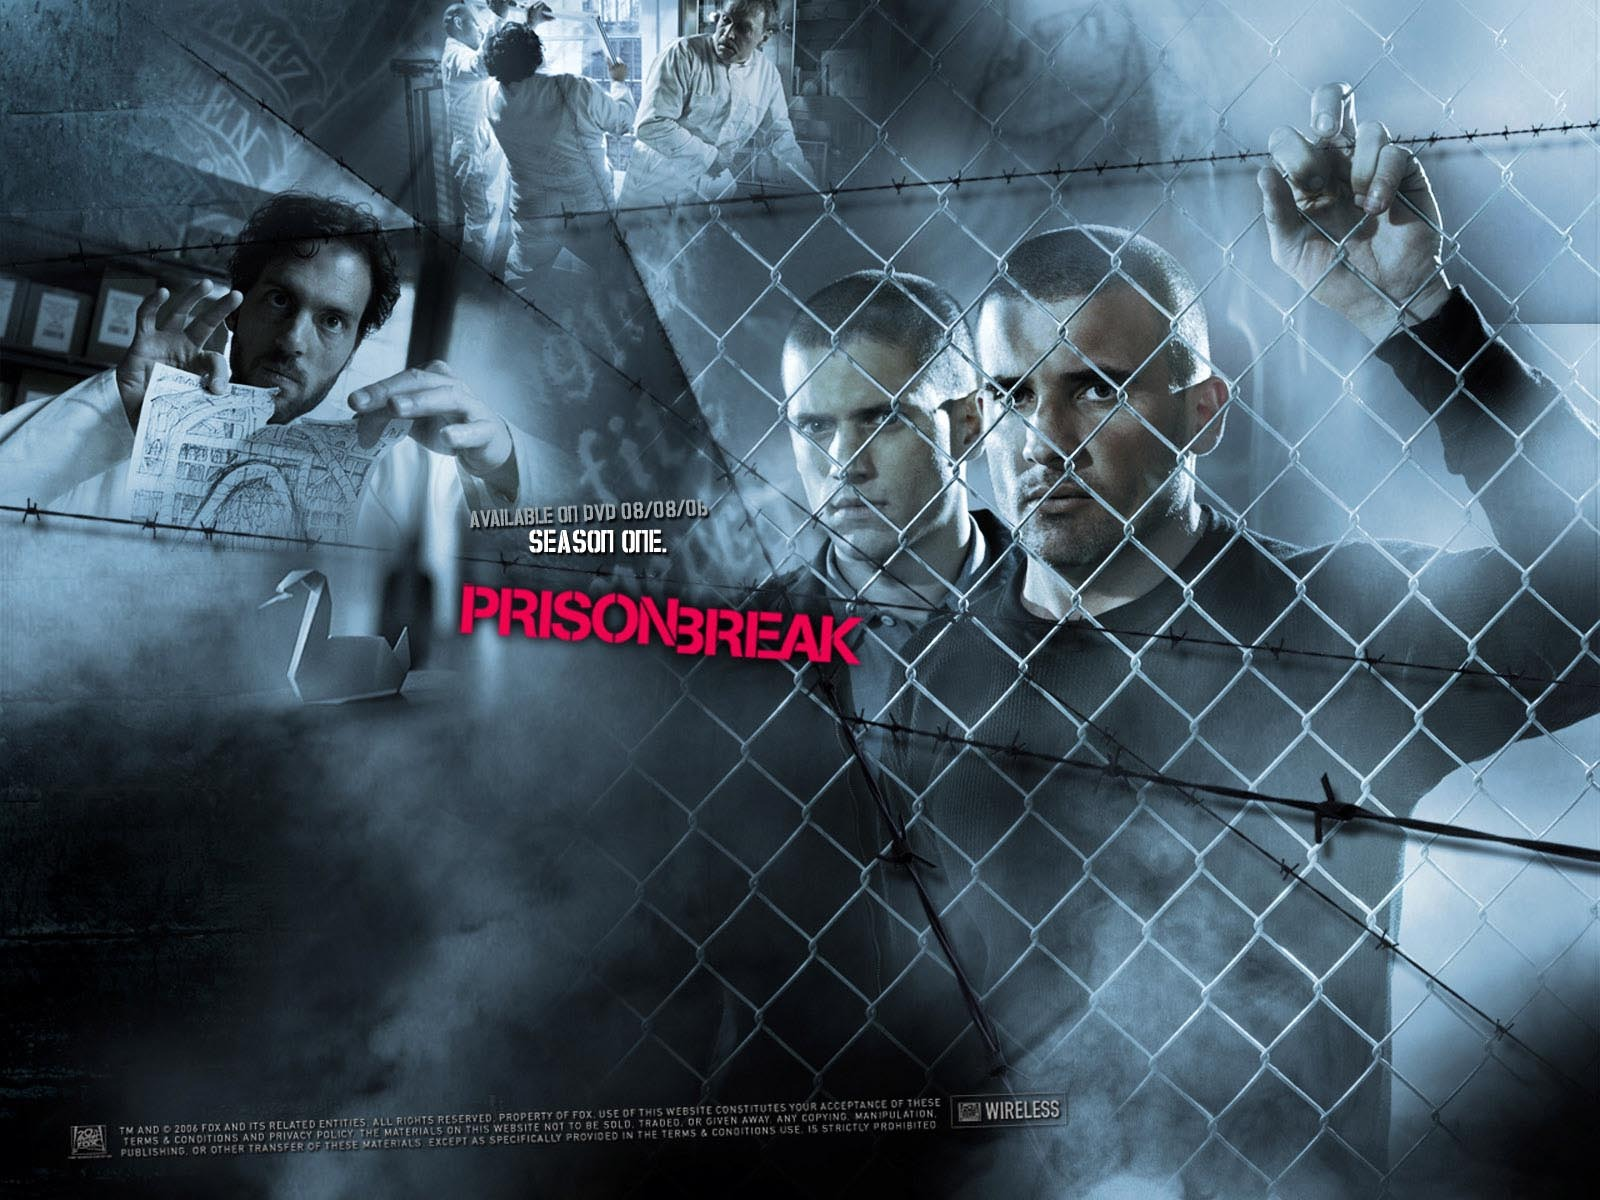 Haywire Burrows Scofield Wallpaper Prison Break Movies Wallpapers In Jpg Format For Free Download